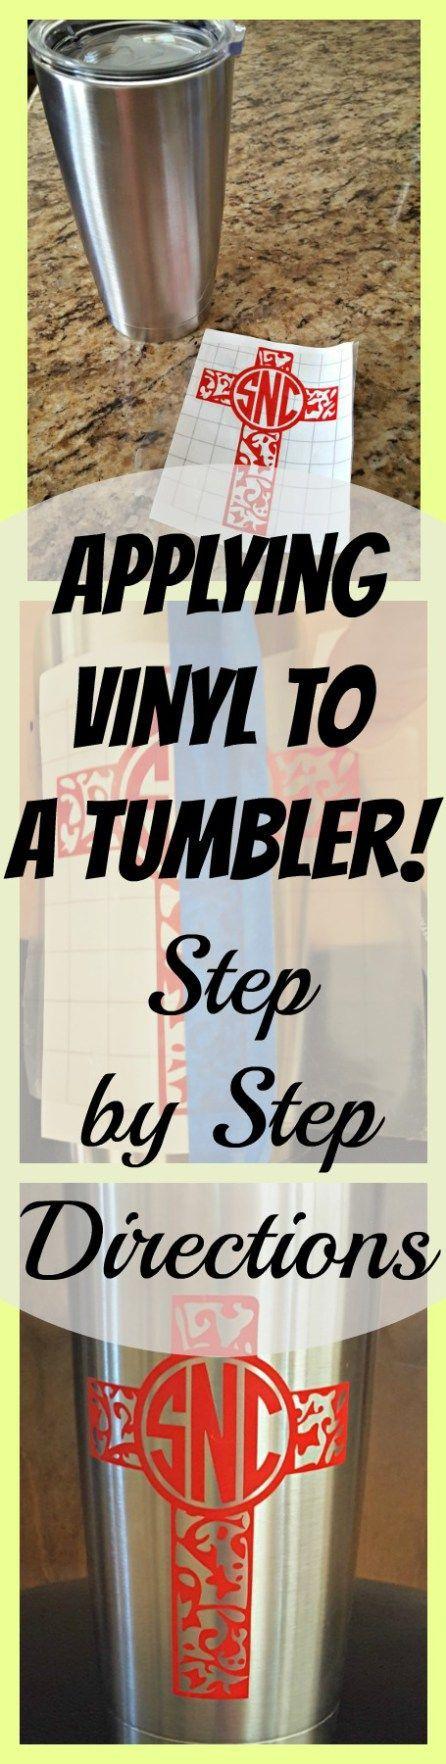 Applying Vinyl To A Tumbler Tumbler Cricut And Easy - Custom vinyl decal application fluid recipe